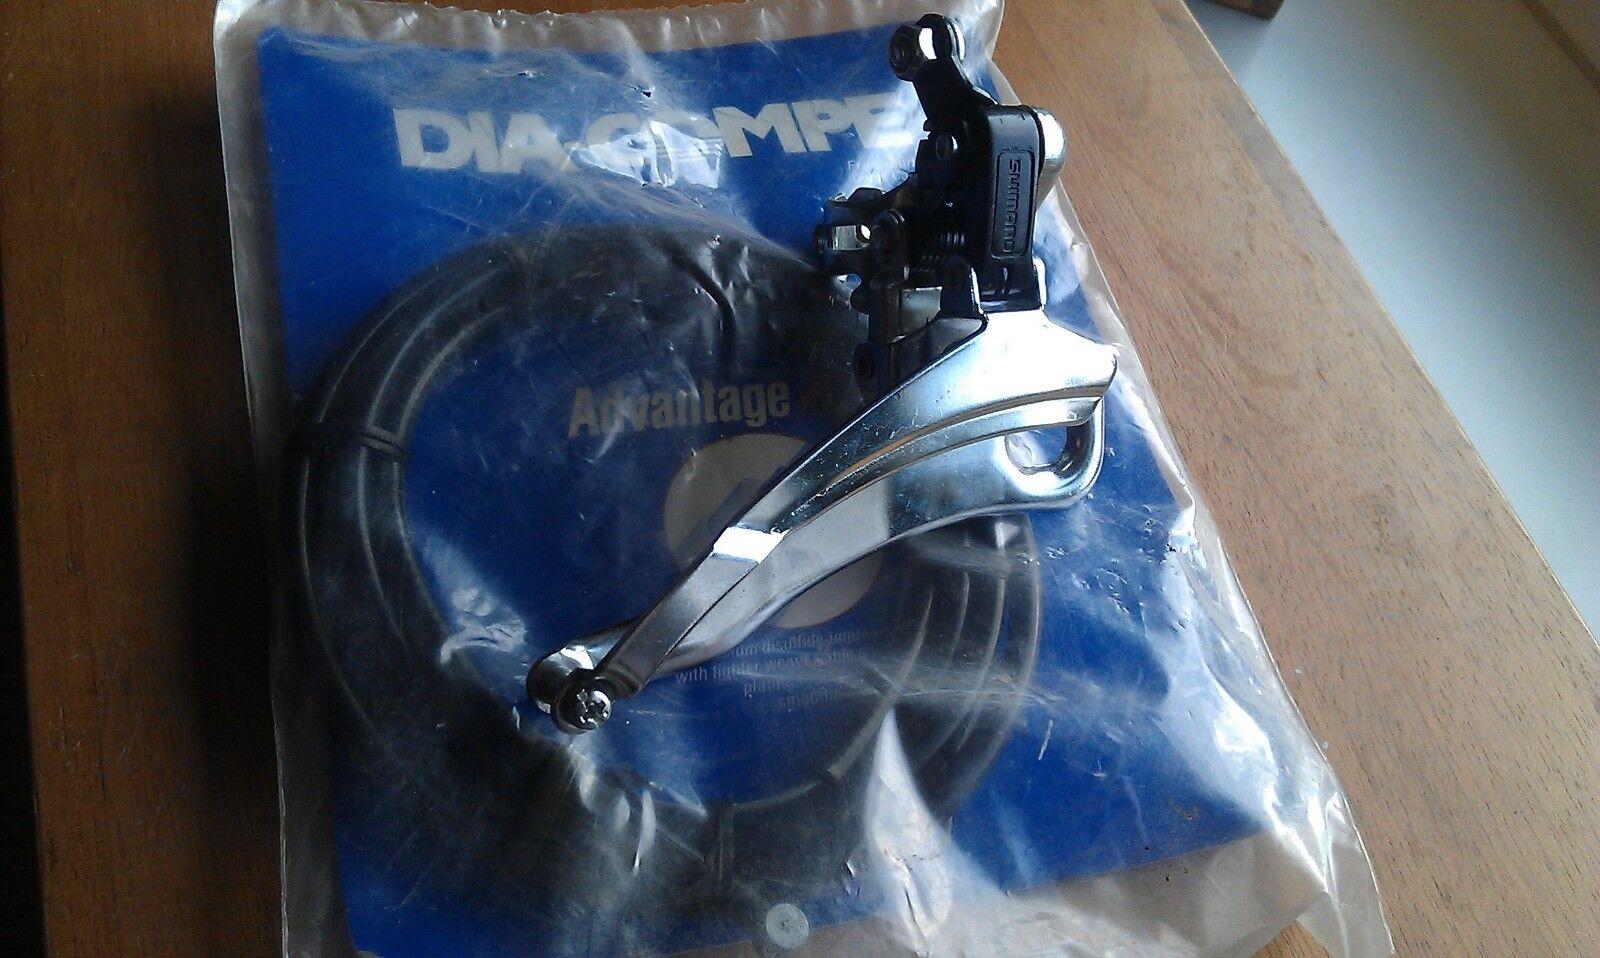 Shimano FD-TY25 Derrailleur Umwerfer Rennrad Bike Dia Compe Cable MTB BMX ATB